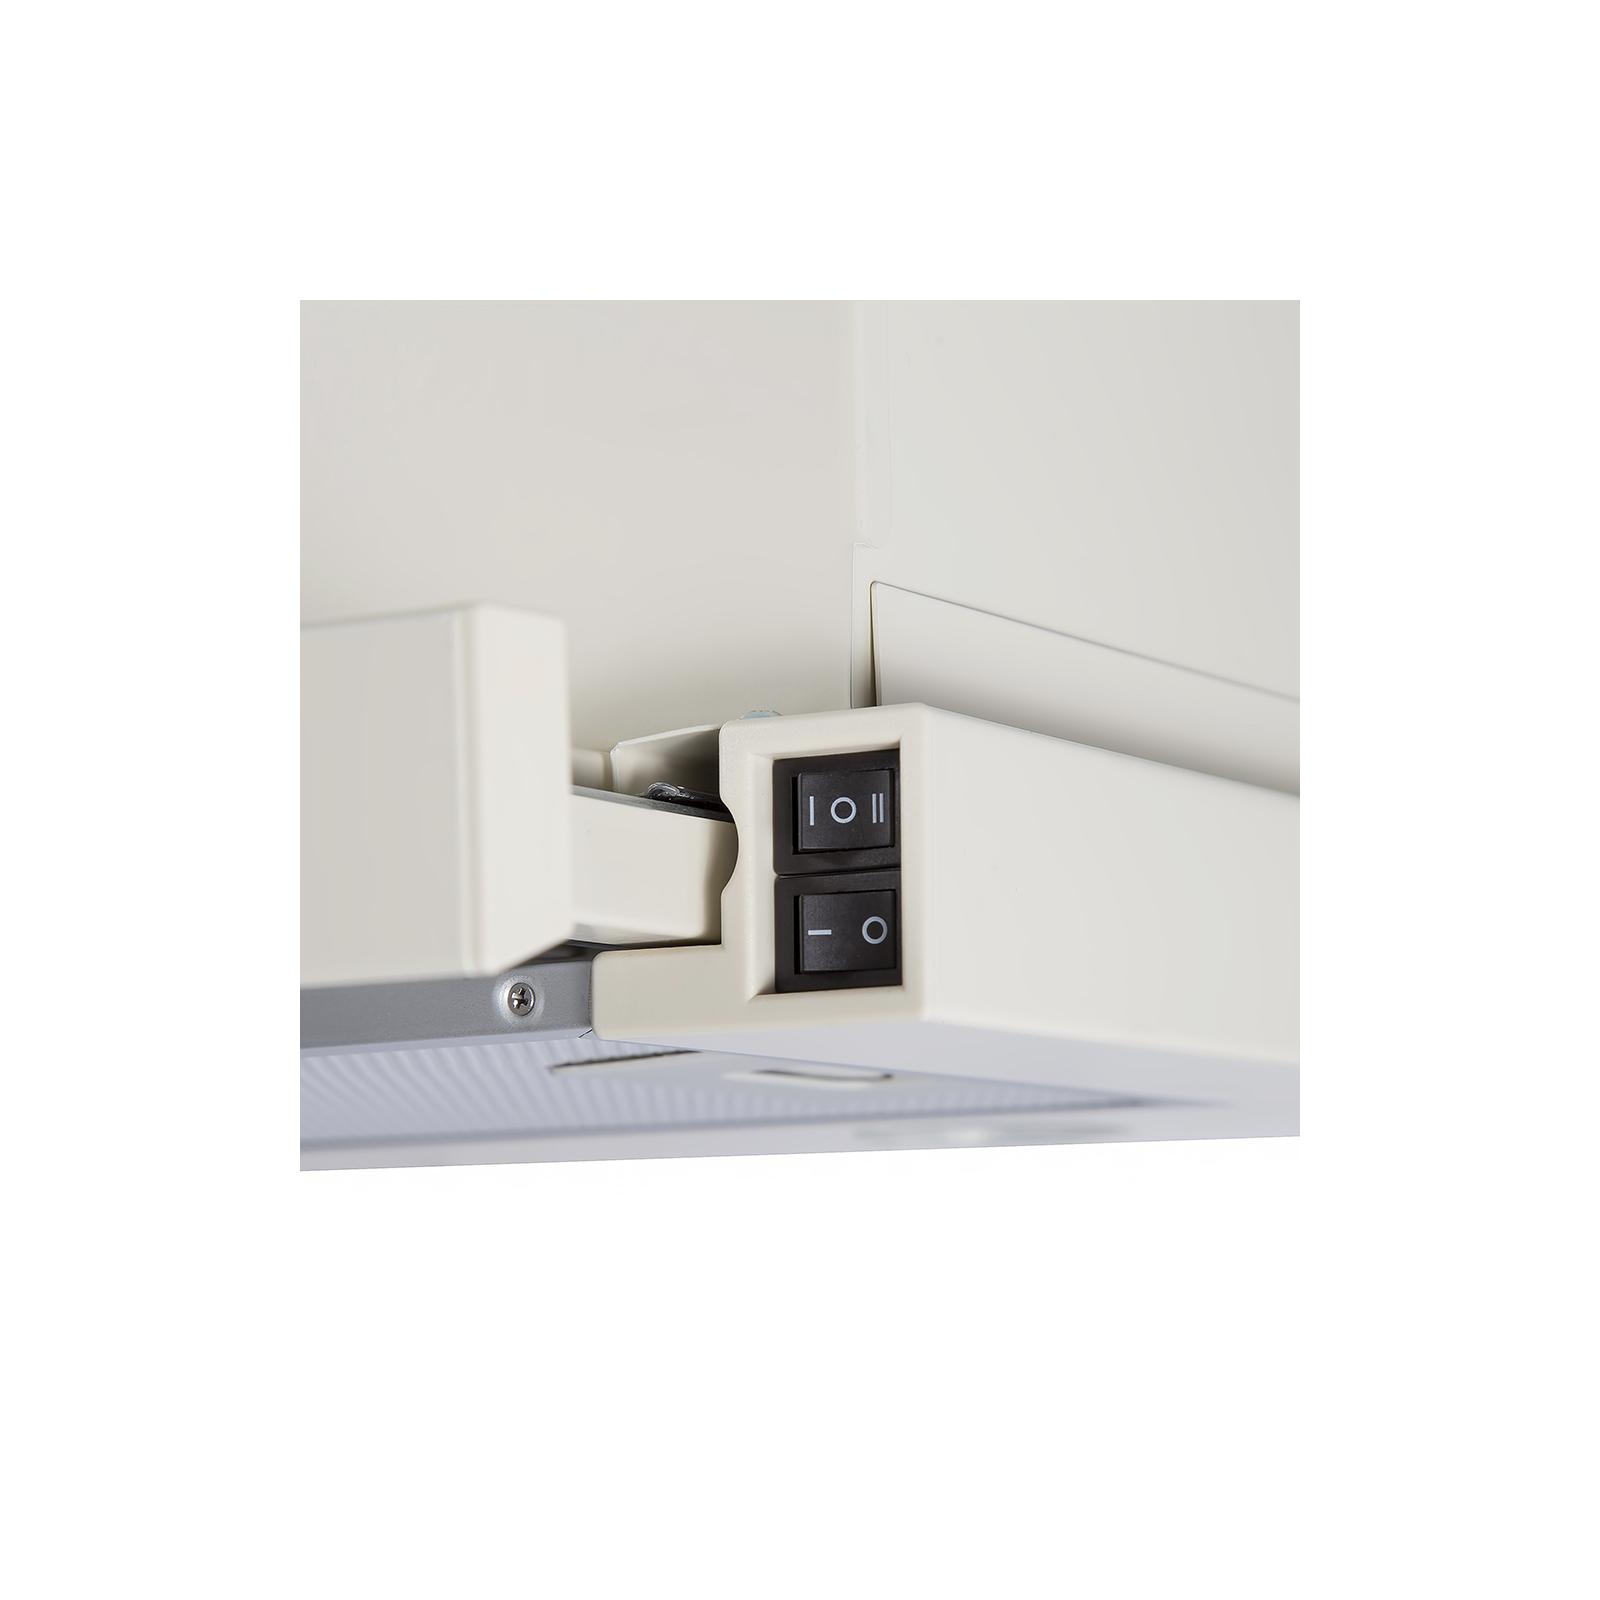 Вытяжка кухонная Perfelli TL 6112 IV LED изображение 3